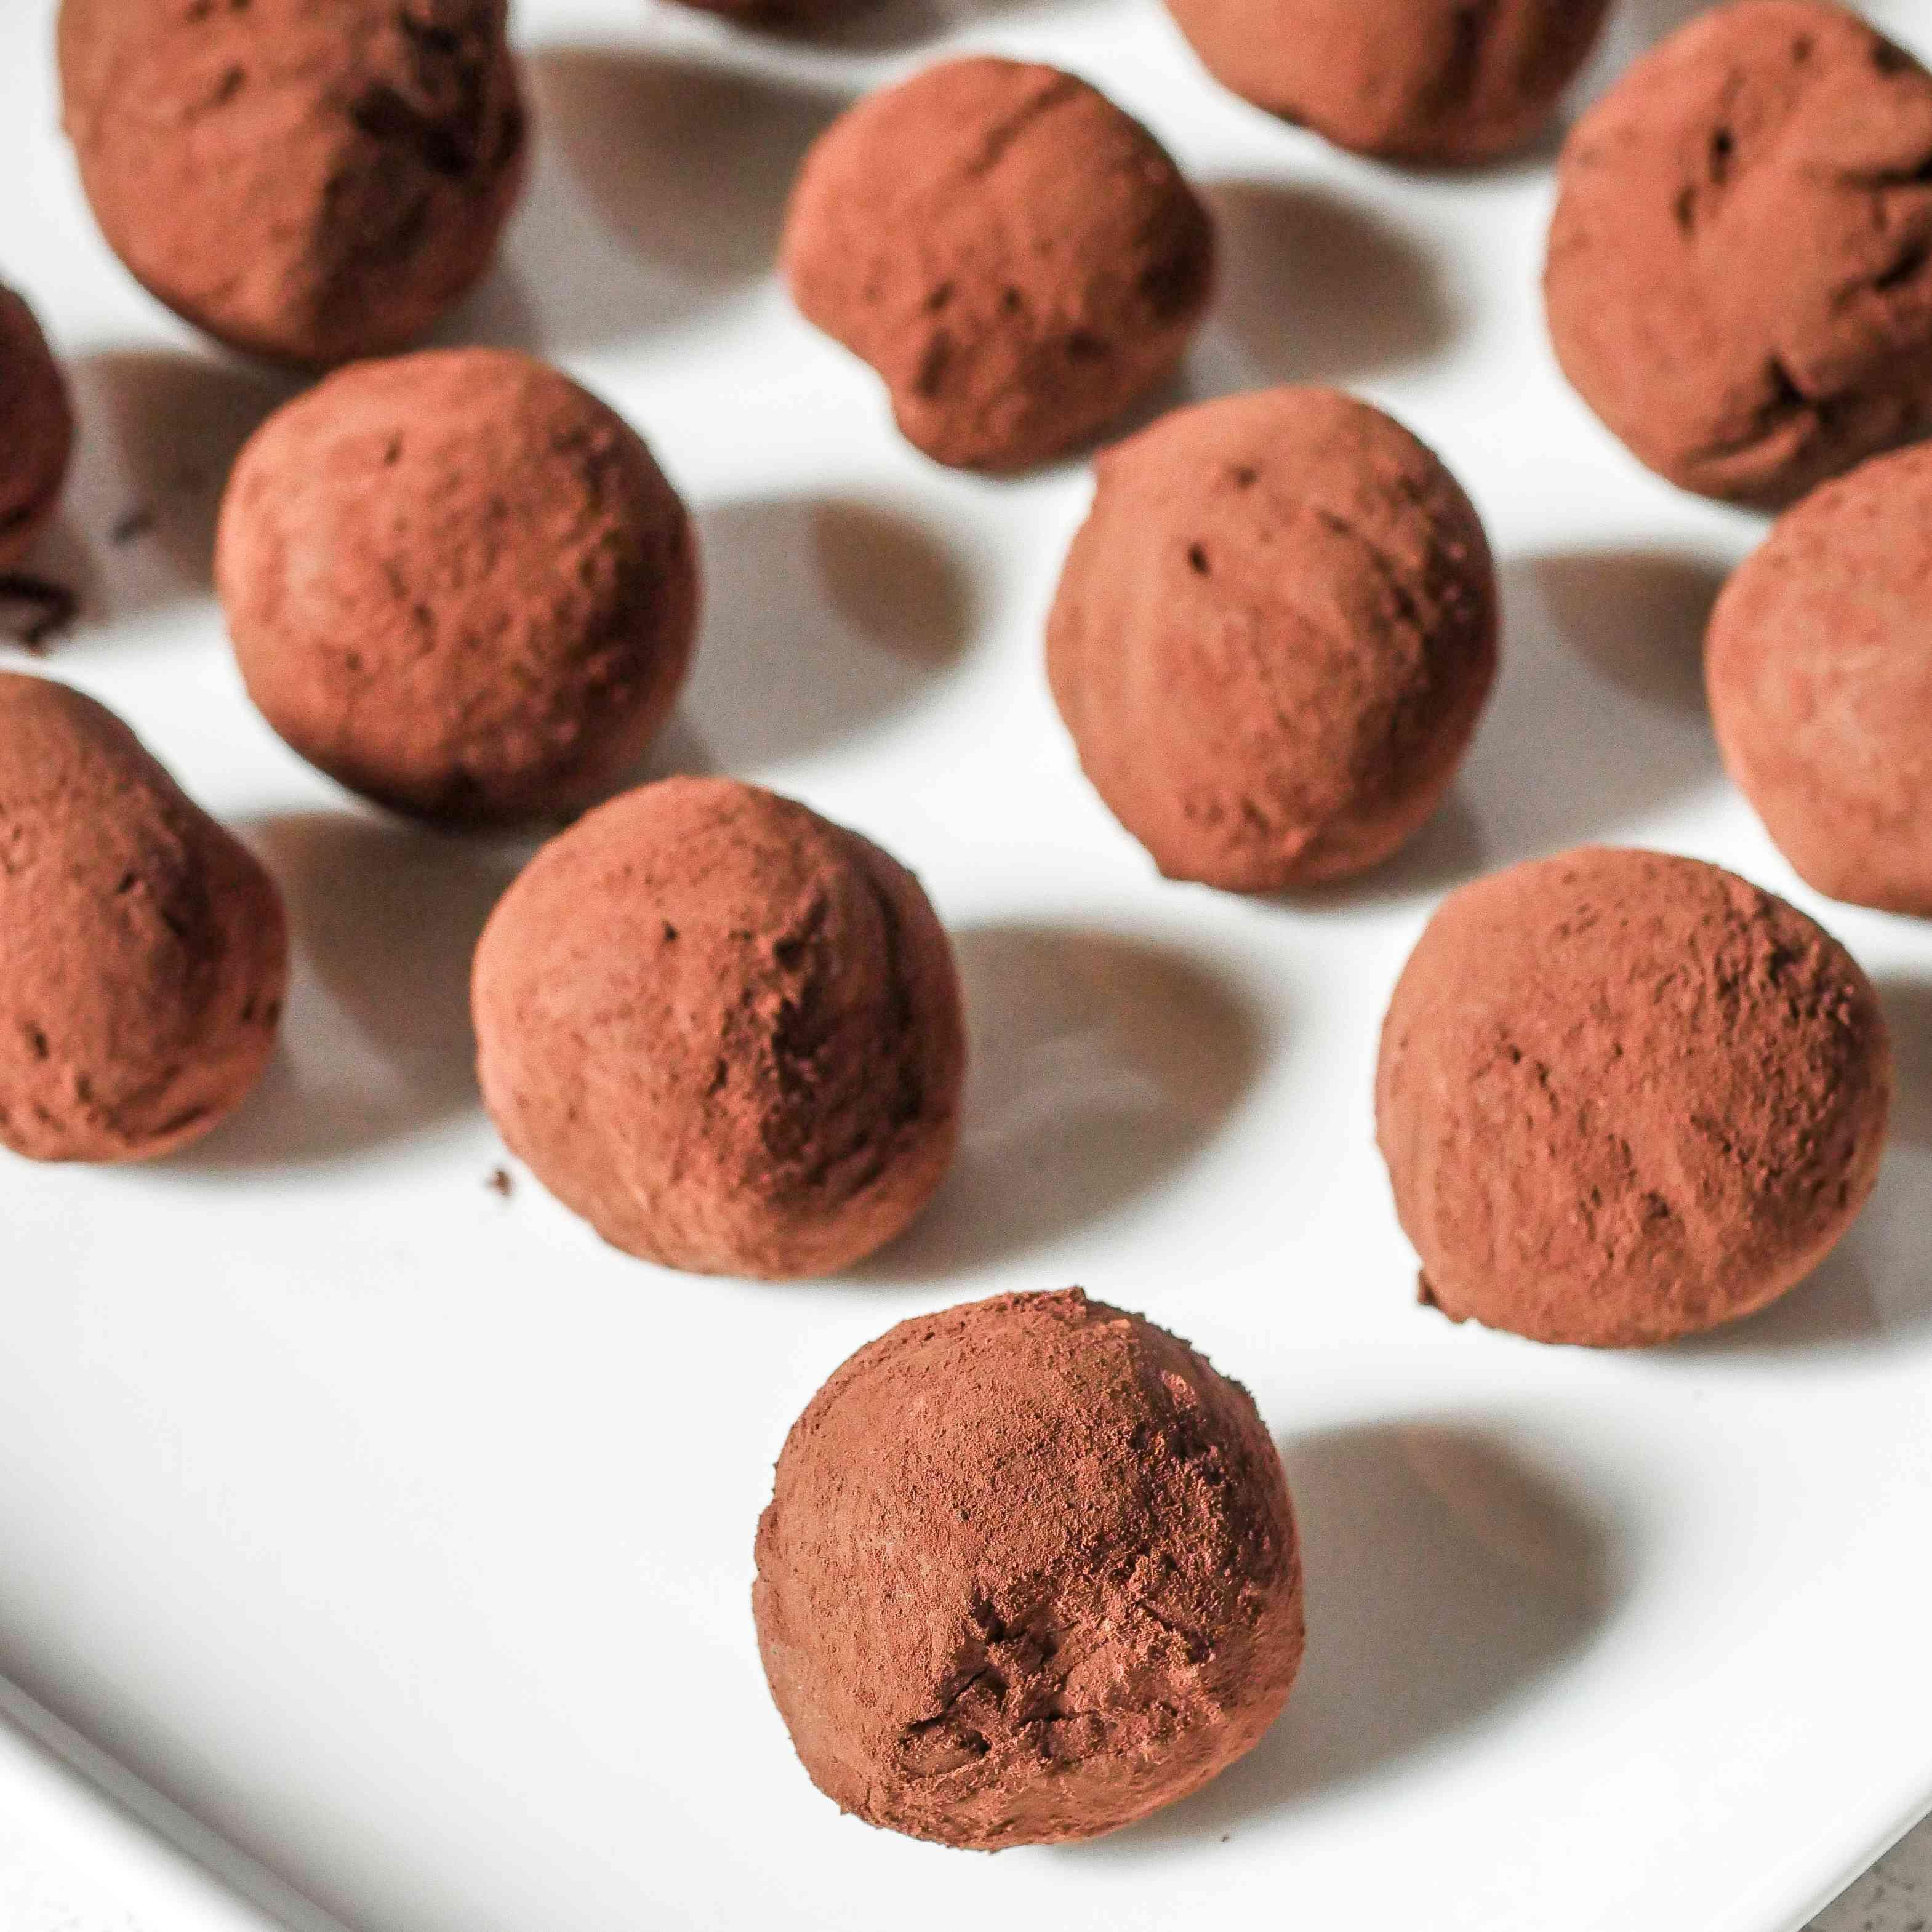 Chocolate Truffles with Irish Whiskey on a platter.